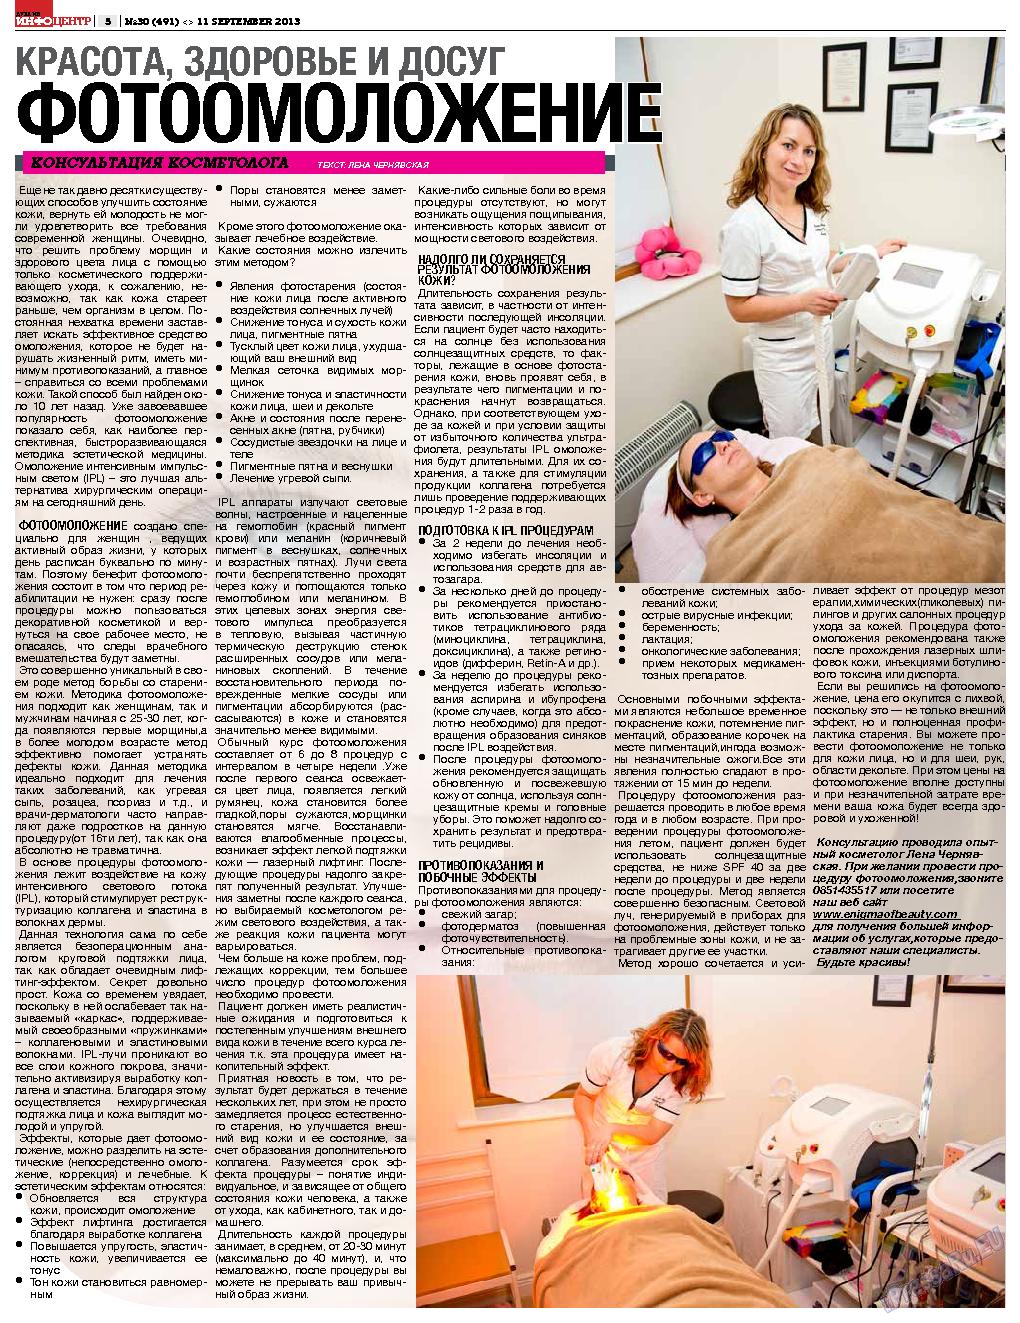 Дублин инфоцентр (газета). 2013 год, номер 30, стр. 5